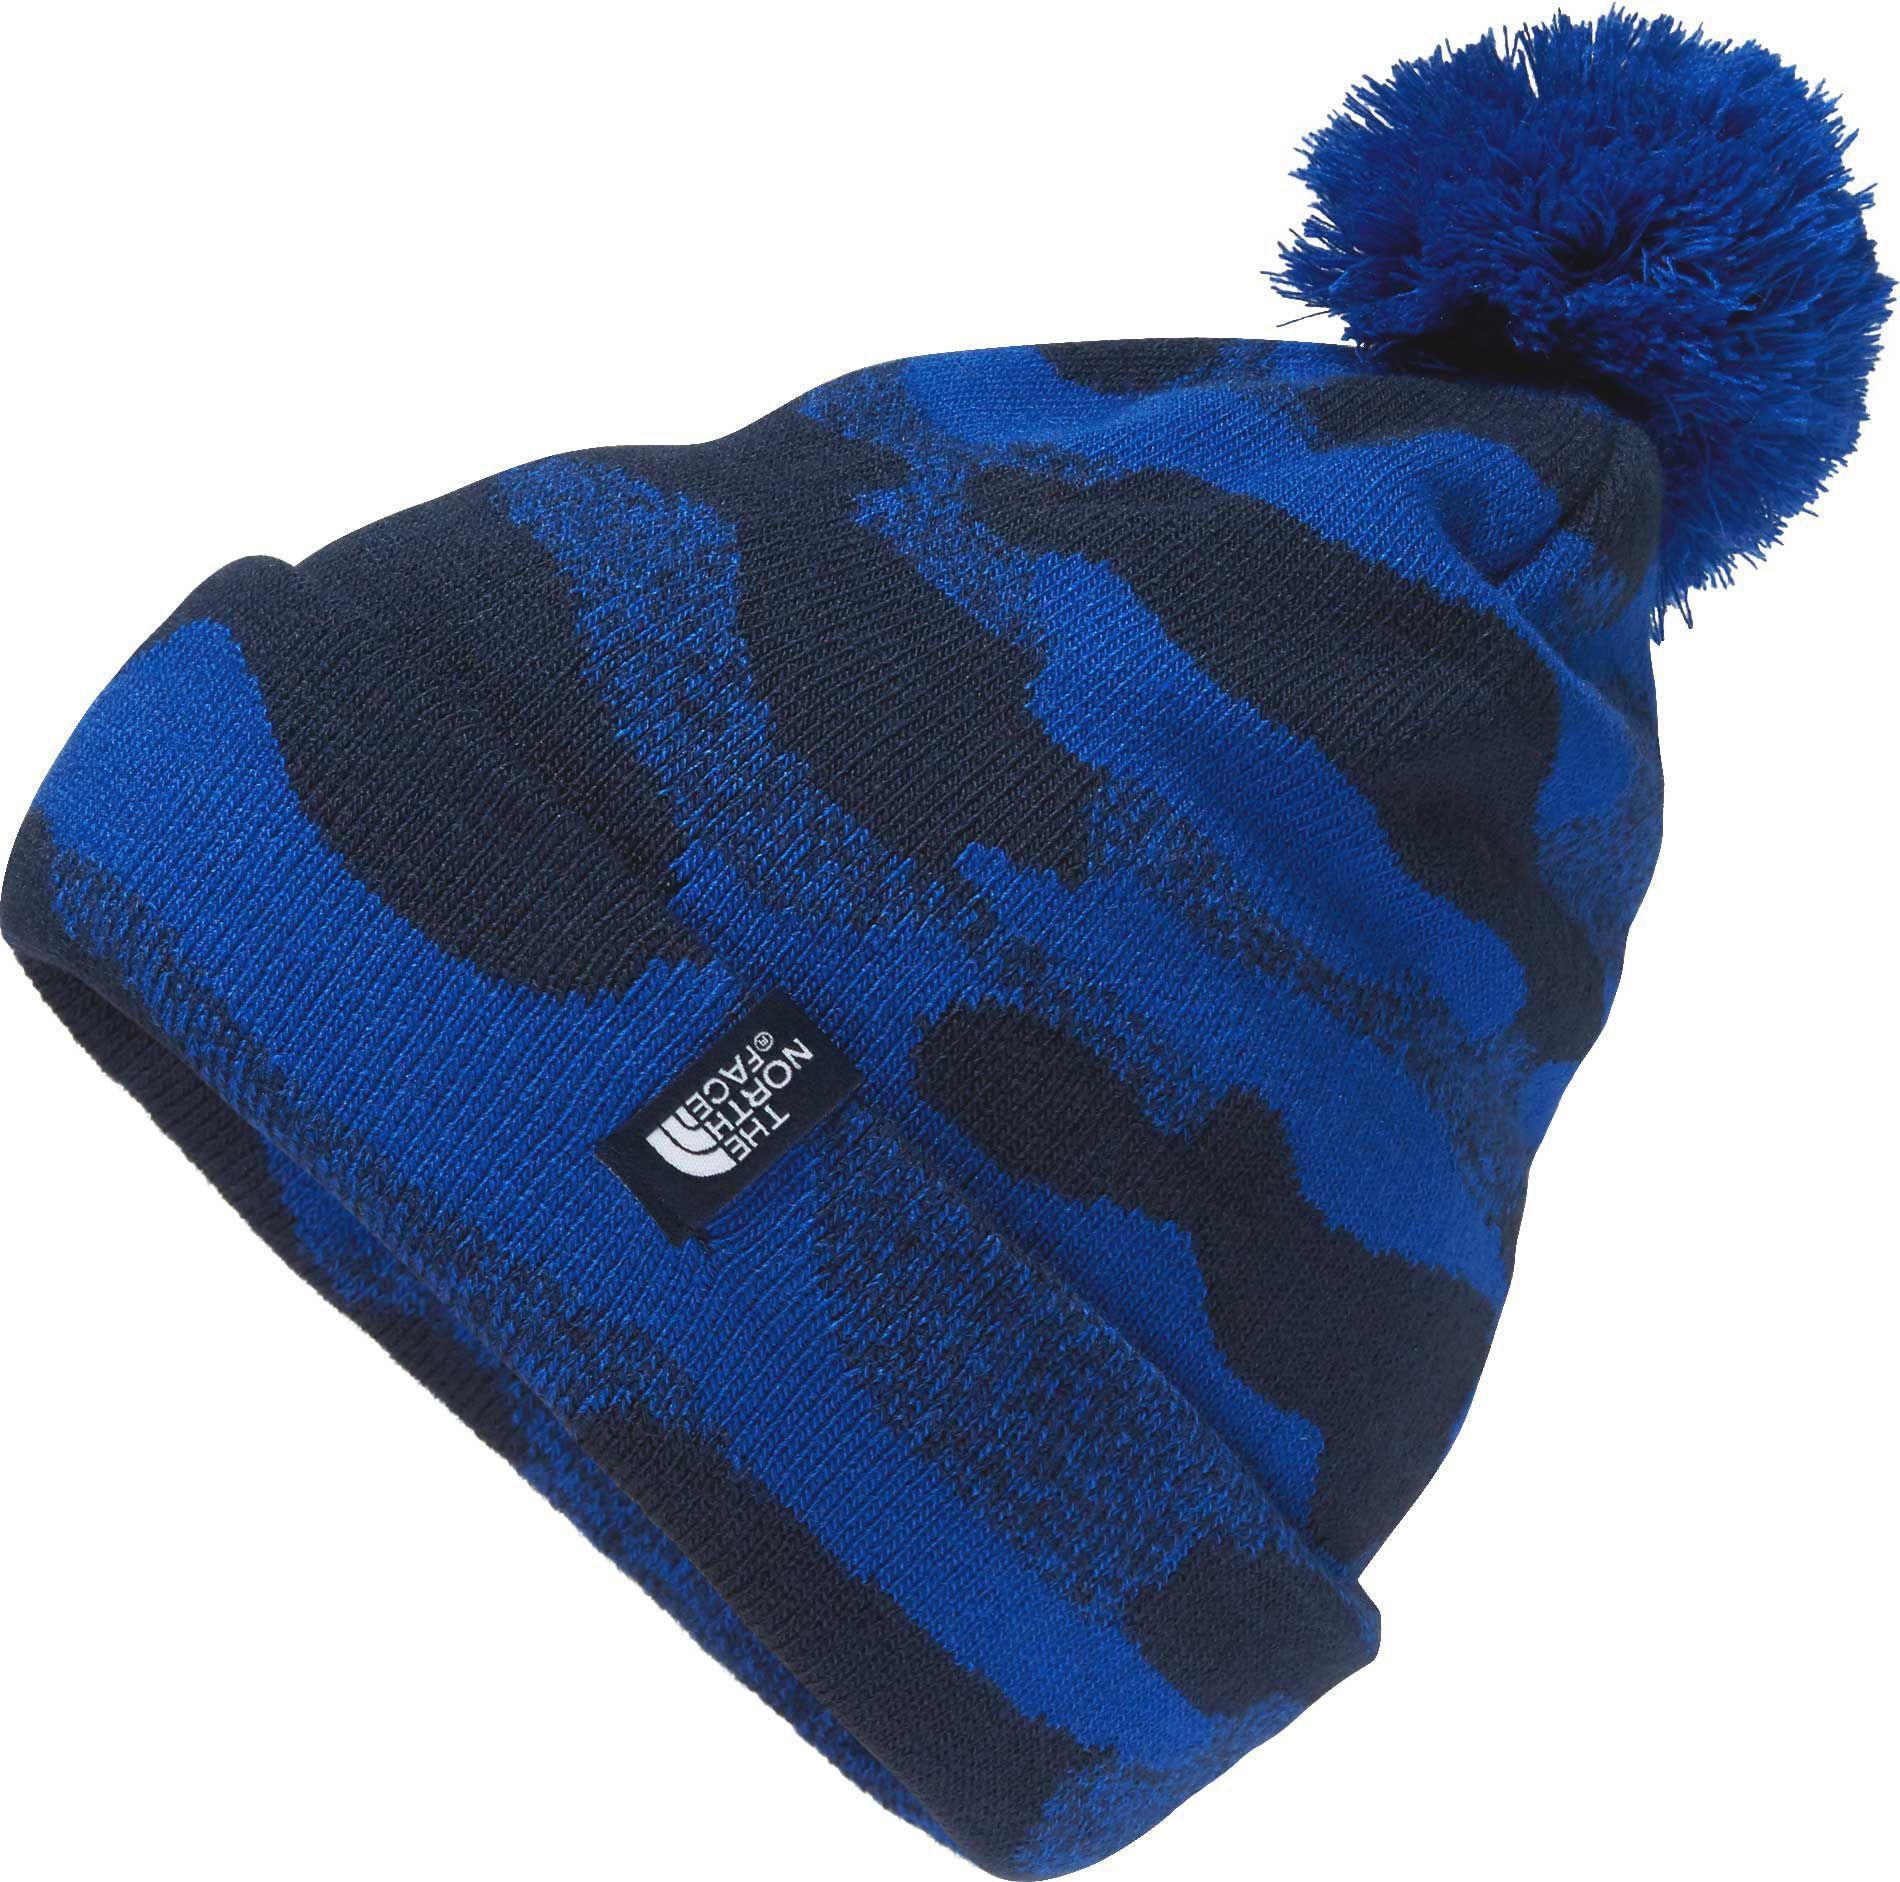 e581885c1 The North Face Blue Youth Ski Tuke Beanie